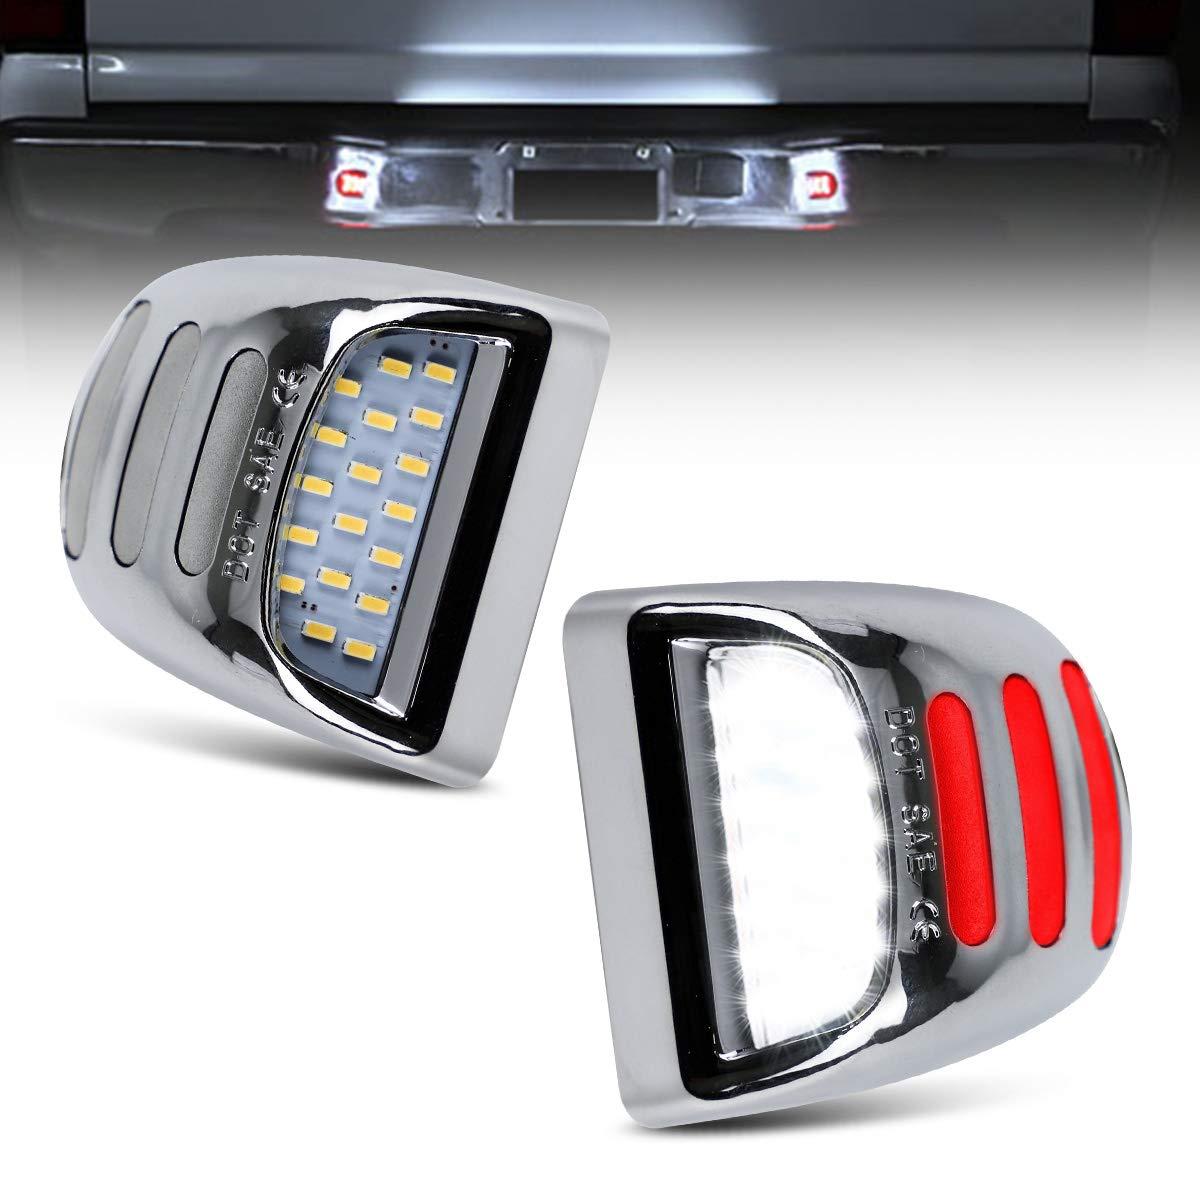 Silve Led License Plate Lights For Chevy Silverado Gmc